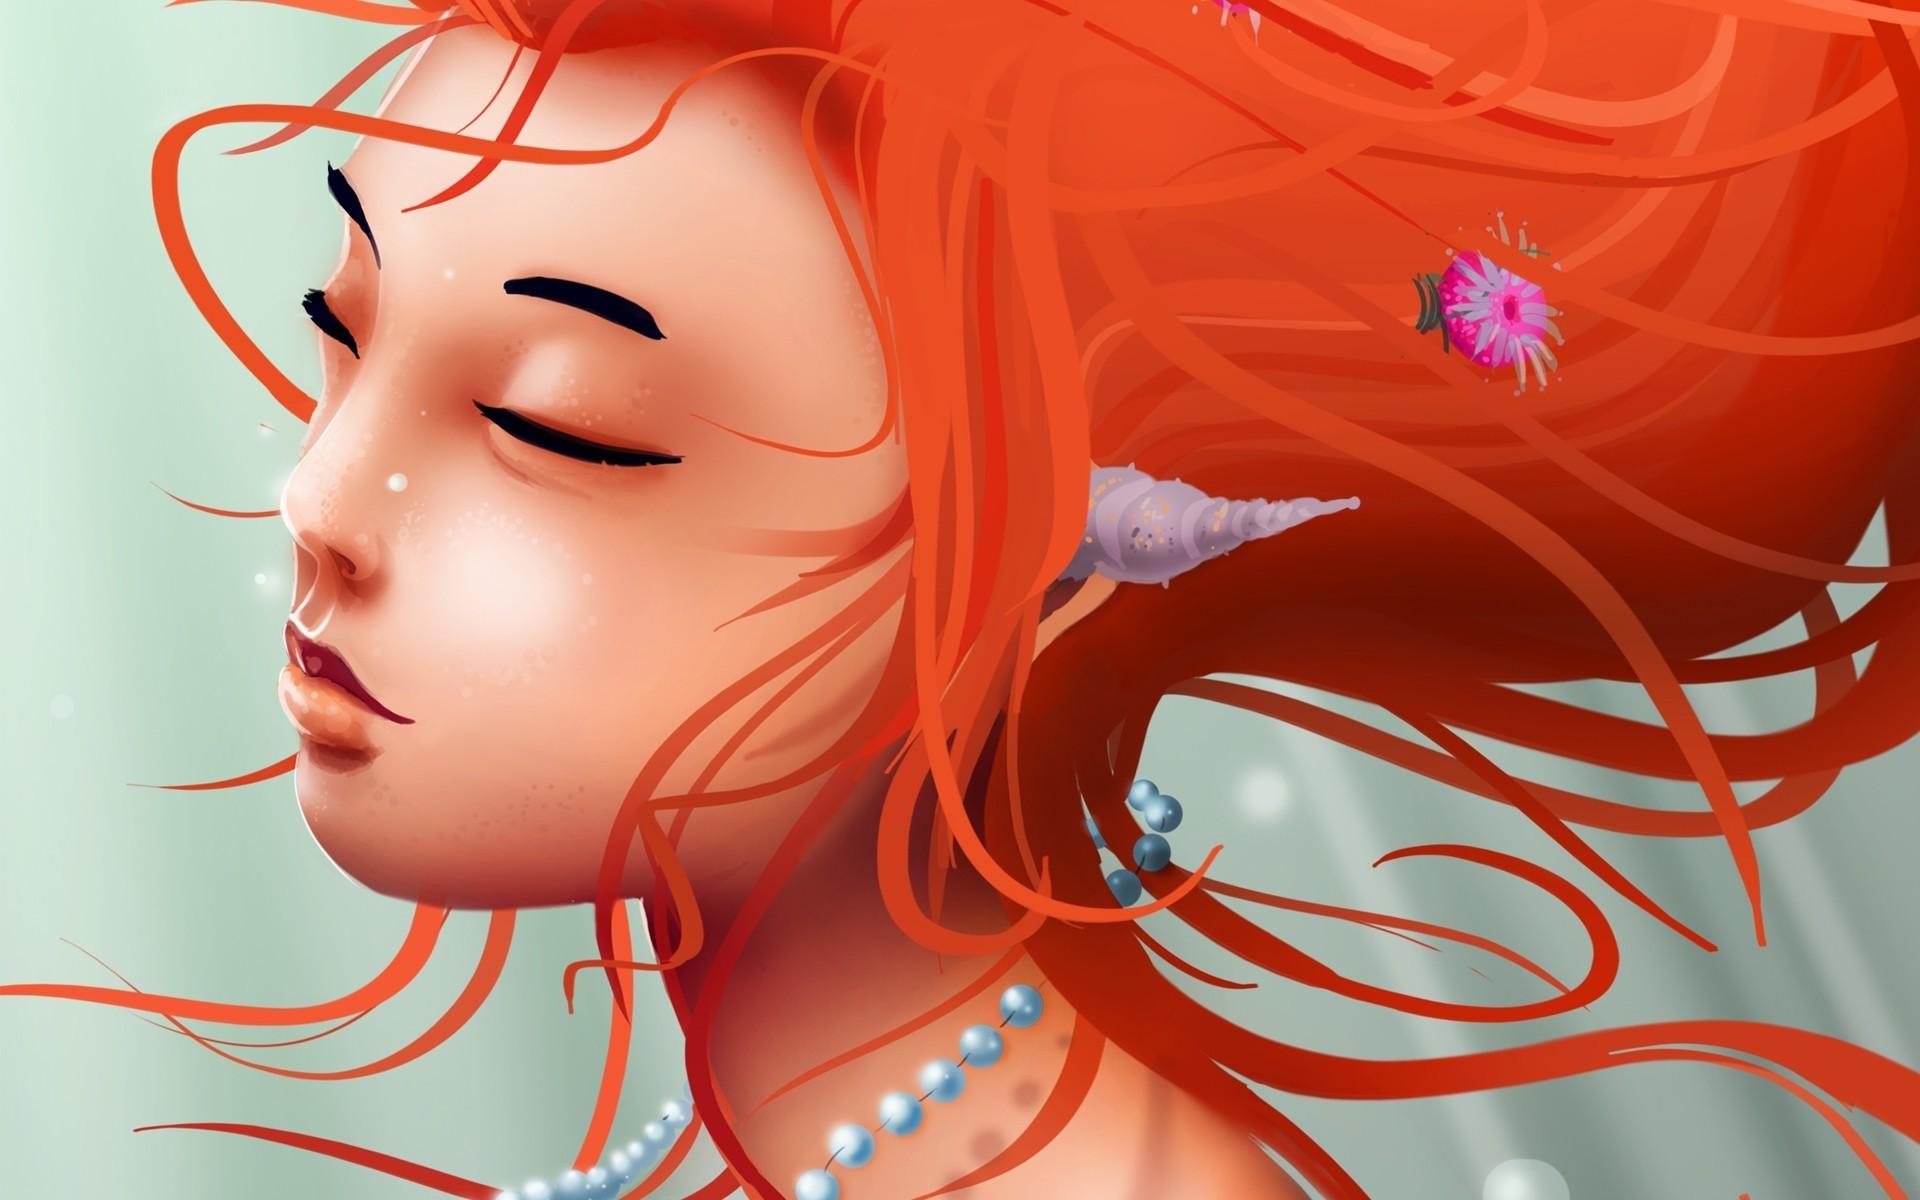 ... women females girl babes beautiful fantasy art wallpaper background